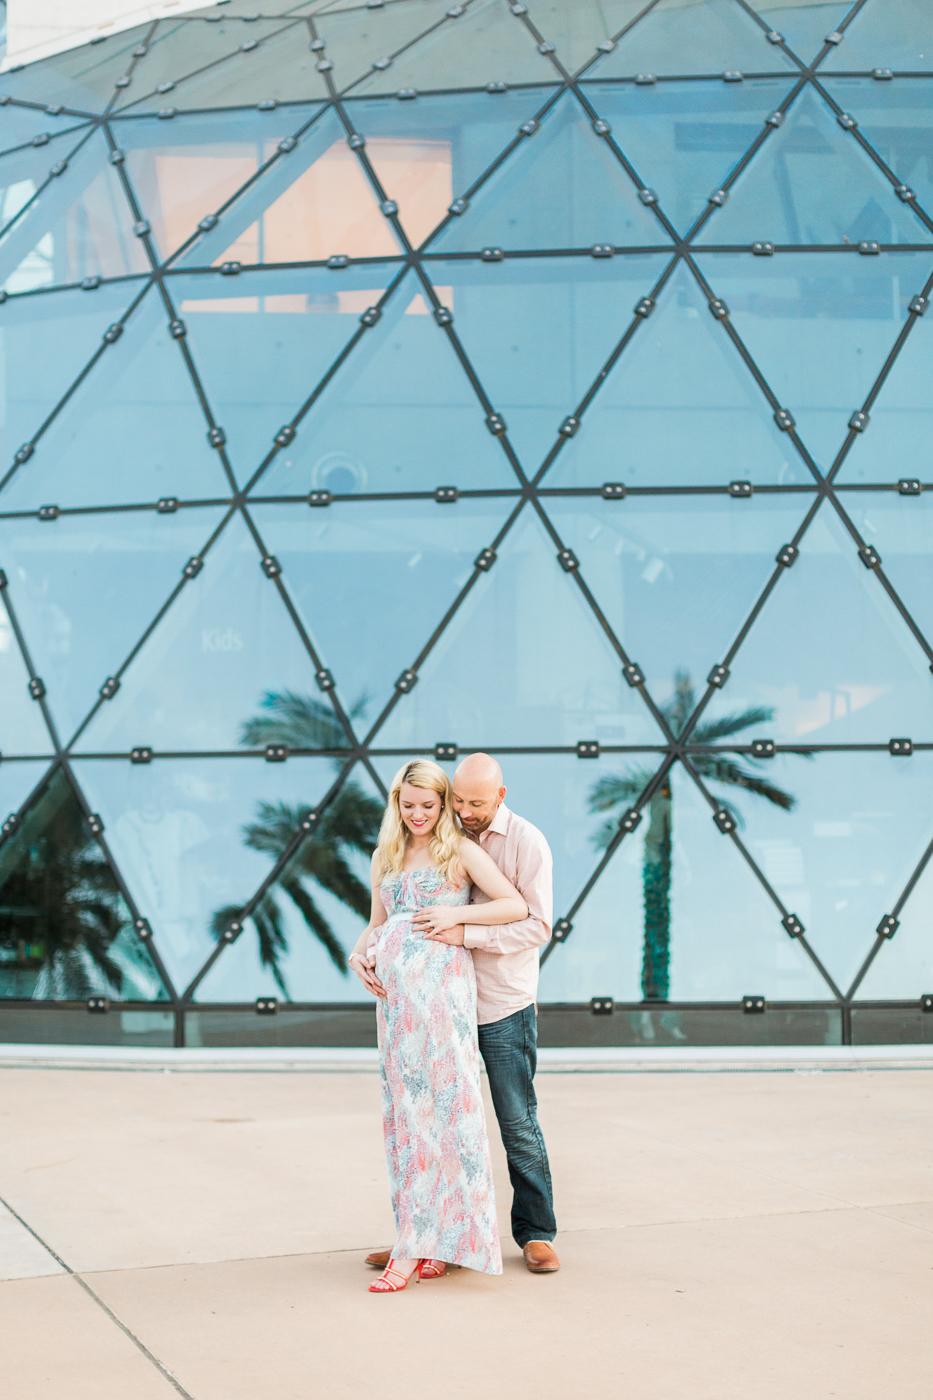 Keti + Mark Maternity - St. petersburg, florida